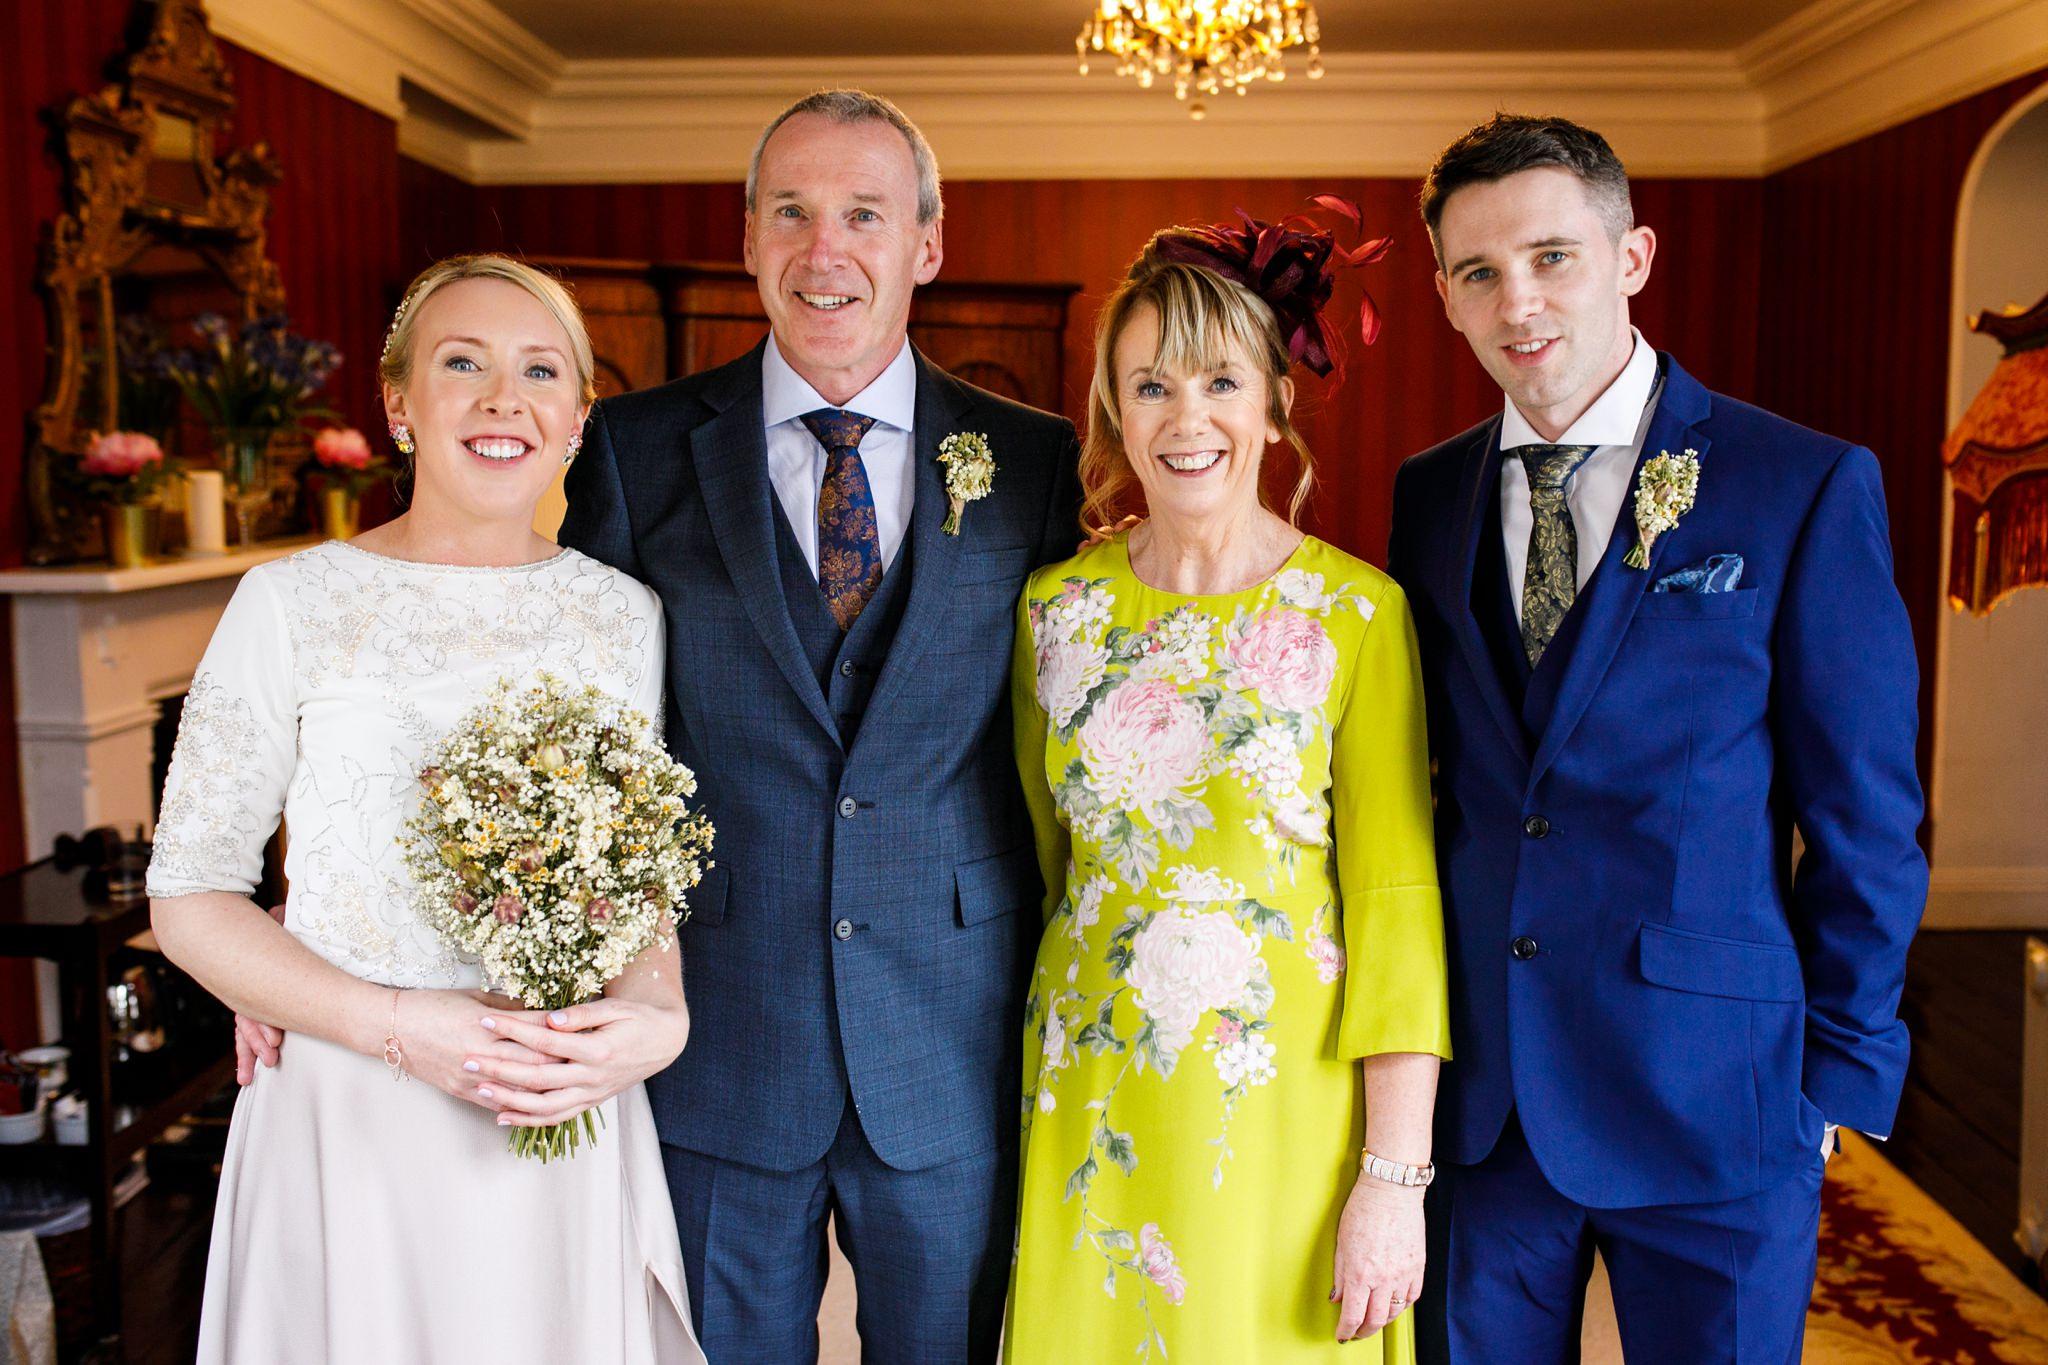 Elisha-Clarke-Photography-Dublin-City-Wedding_0055.jpg